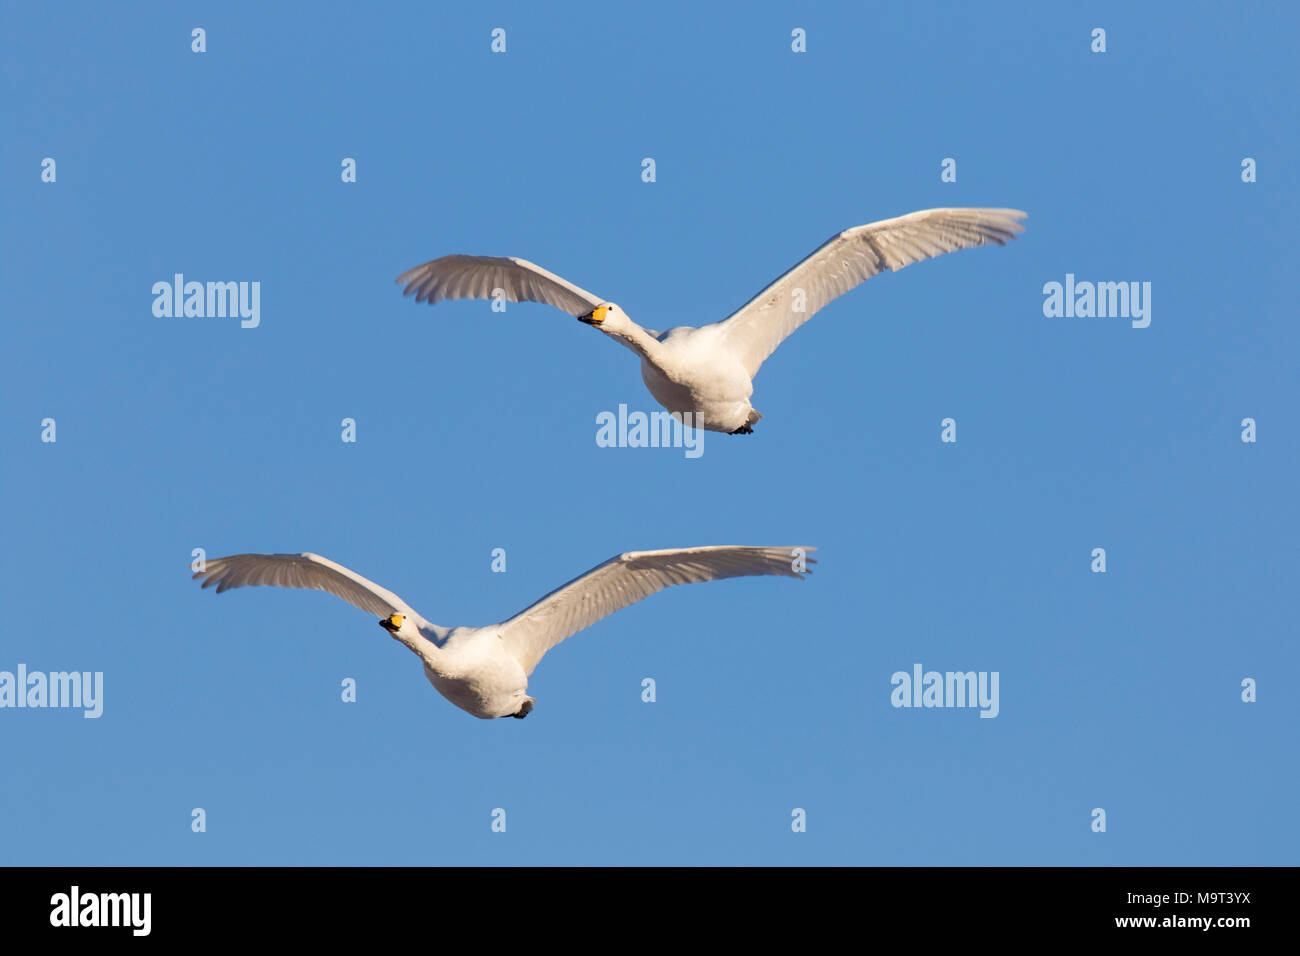 Zwei gehören Singschwan (Cygnus Cygnus) im Flug gegen den blauen Himmel Stockbild